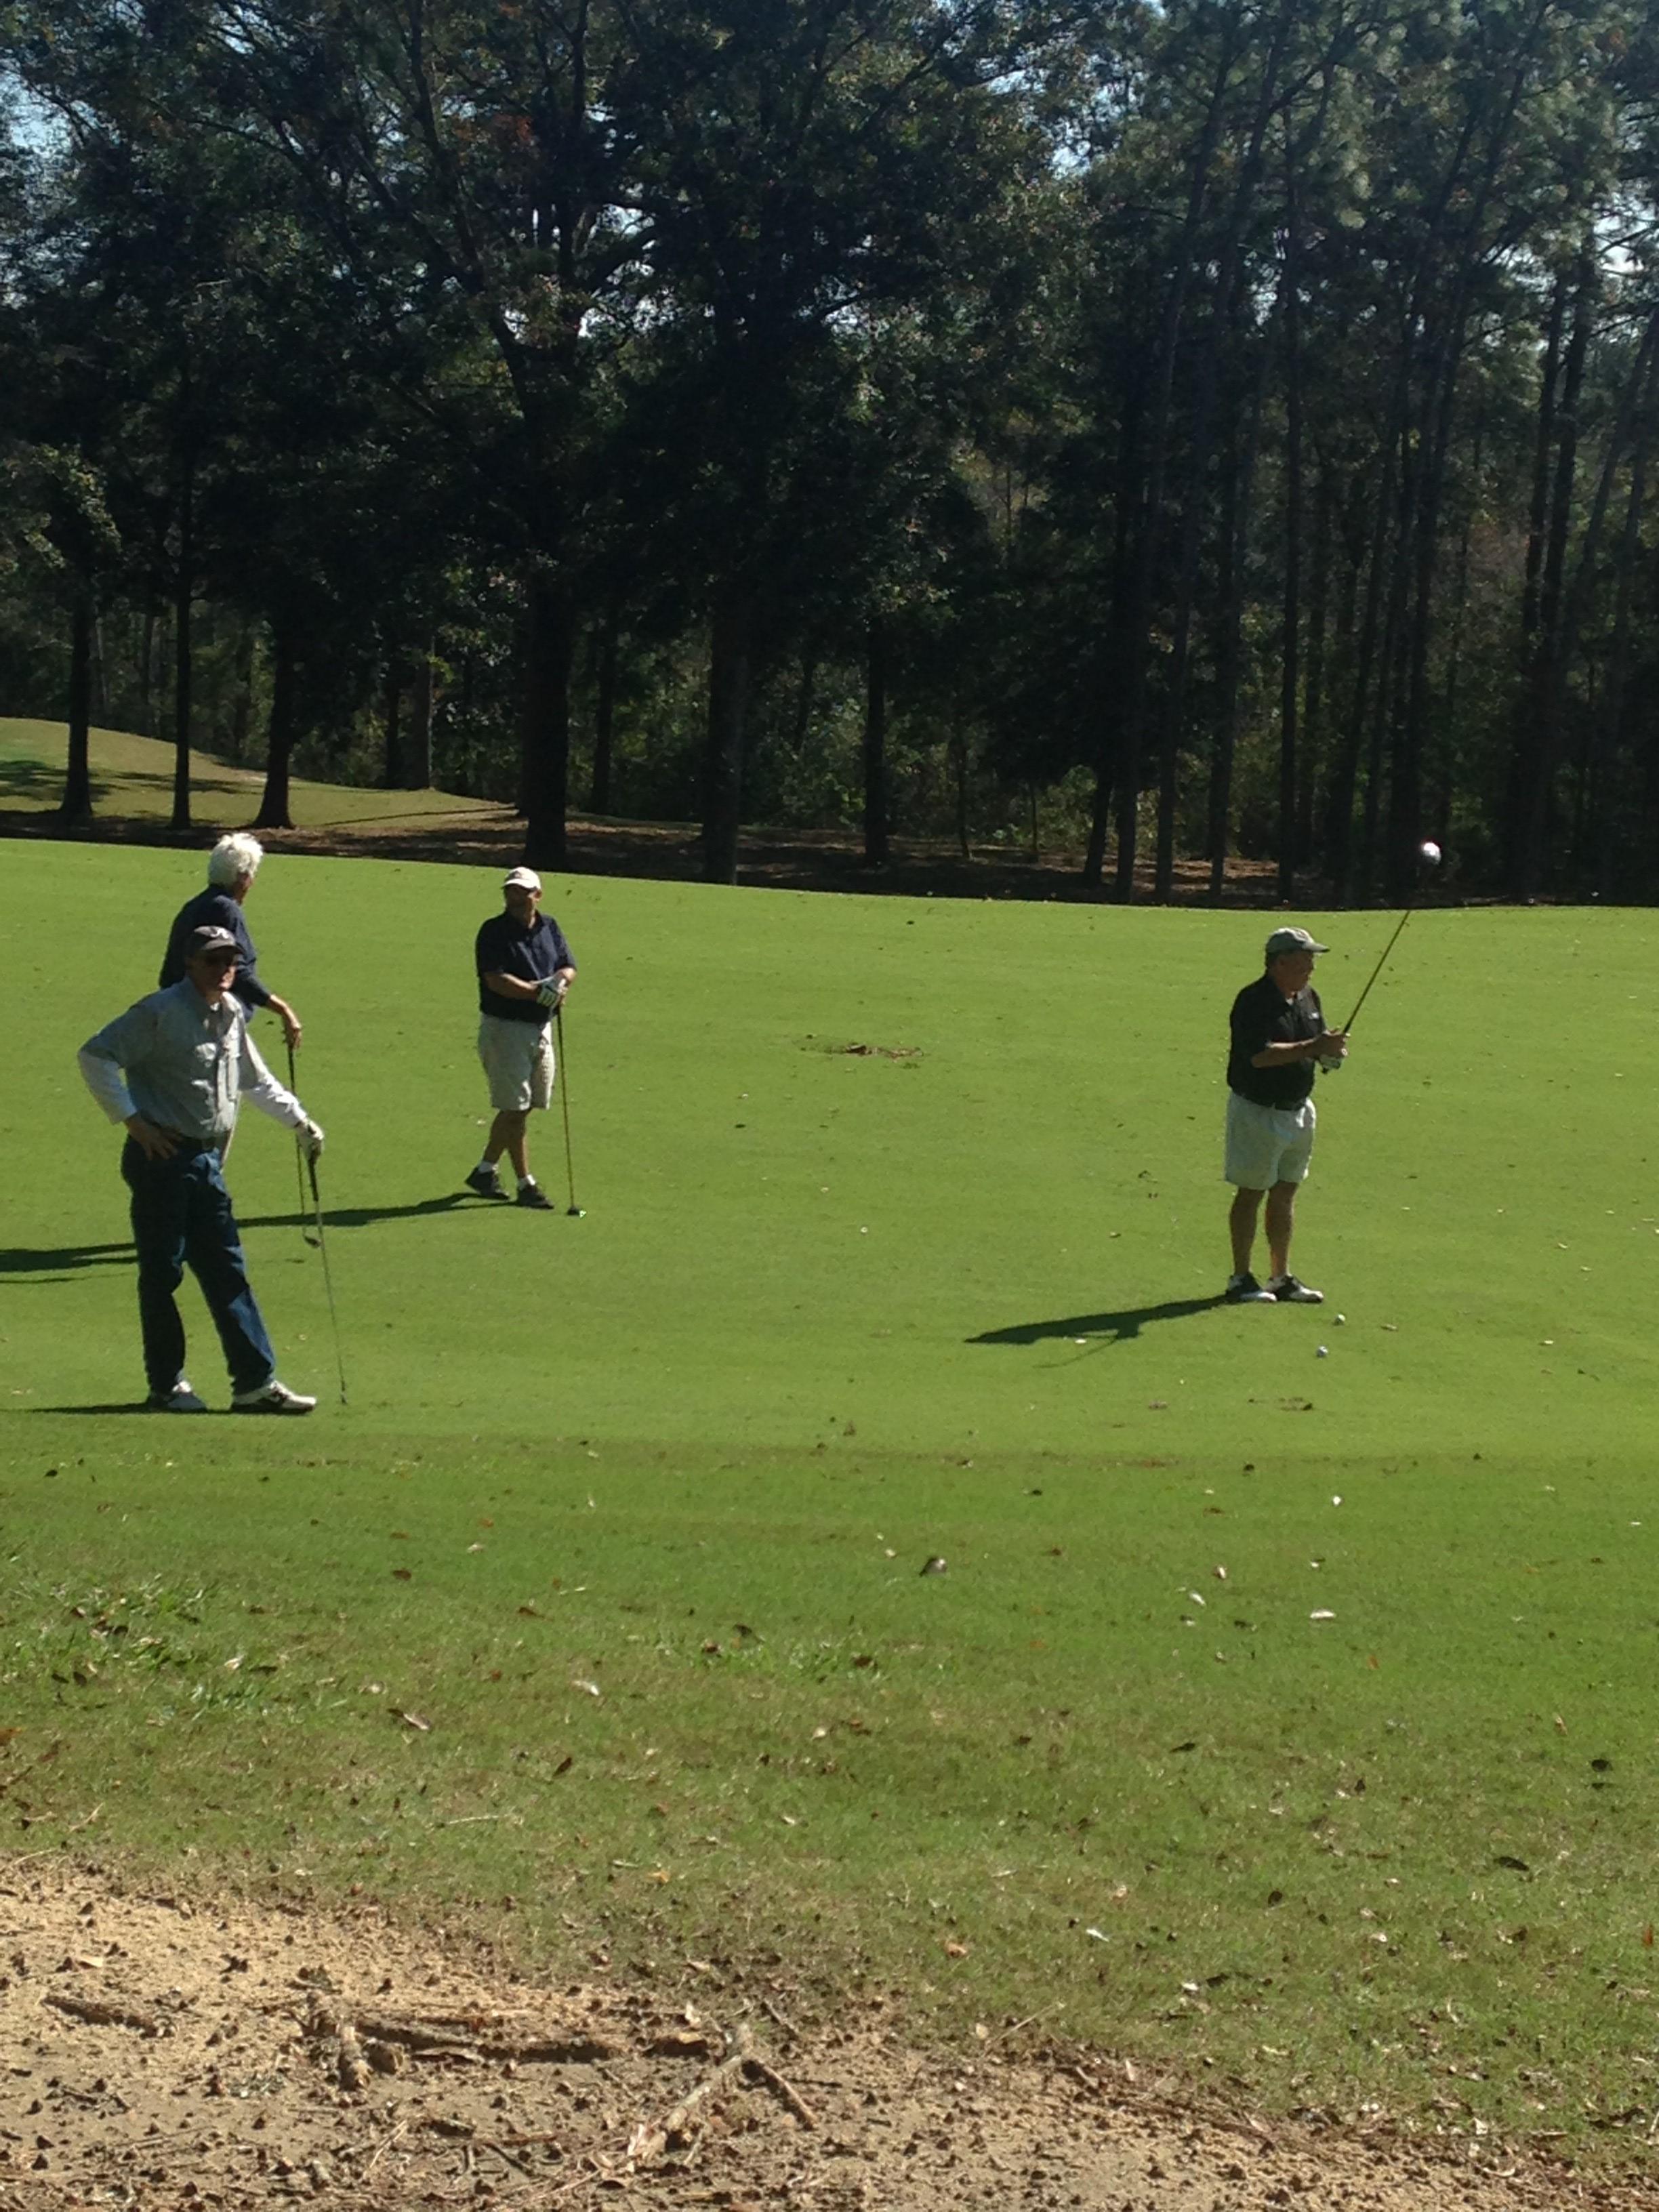 golf-pic-1.jpg